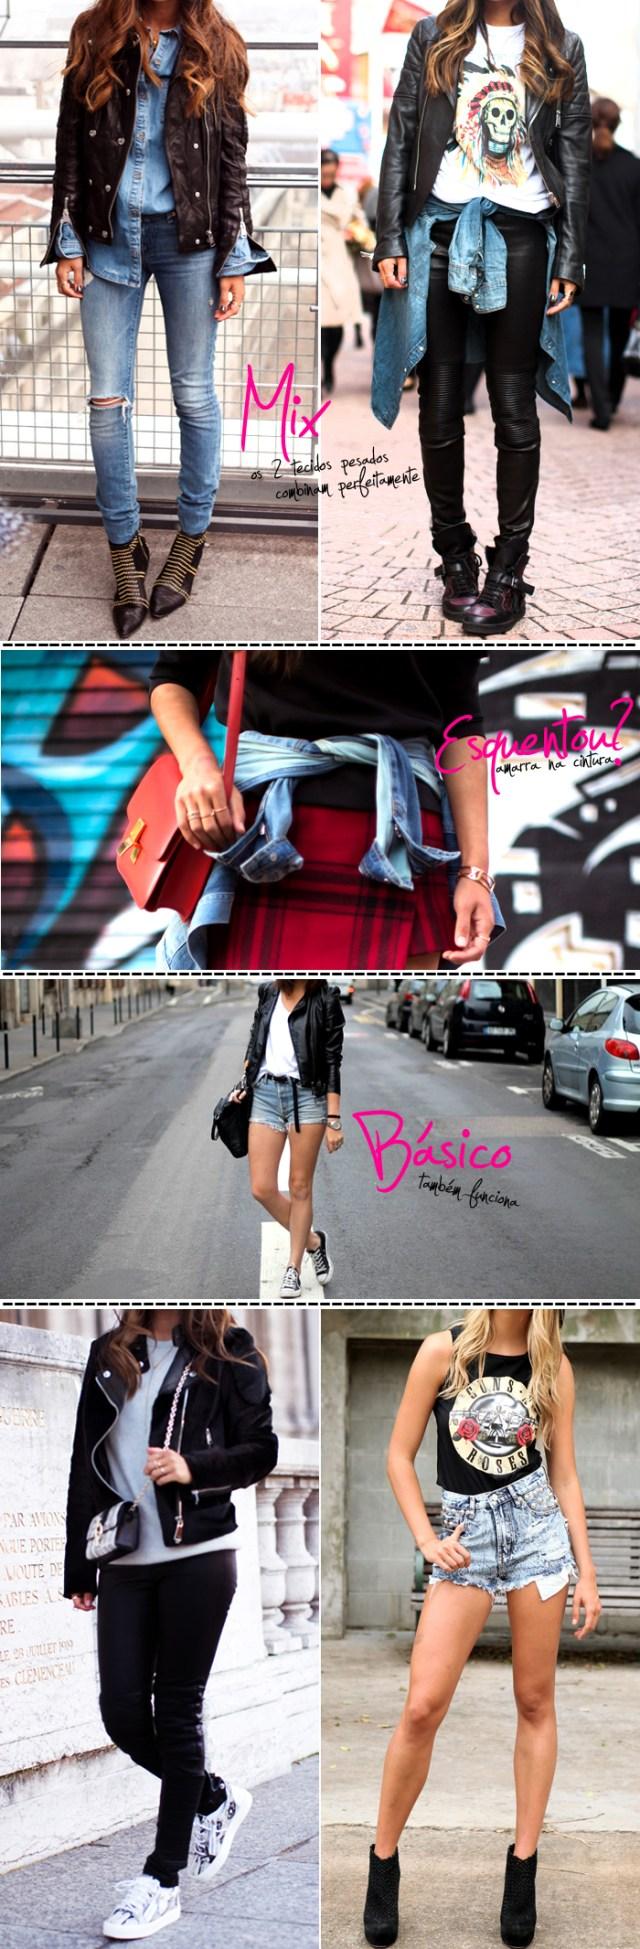 o que usar show de rock guns n roses jeans couro ideia de looks blog got sin3